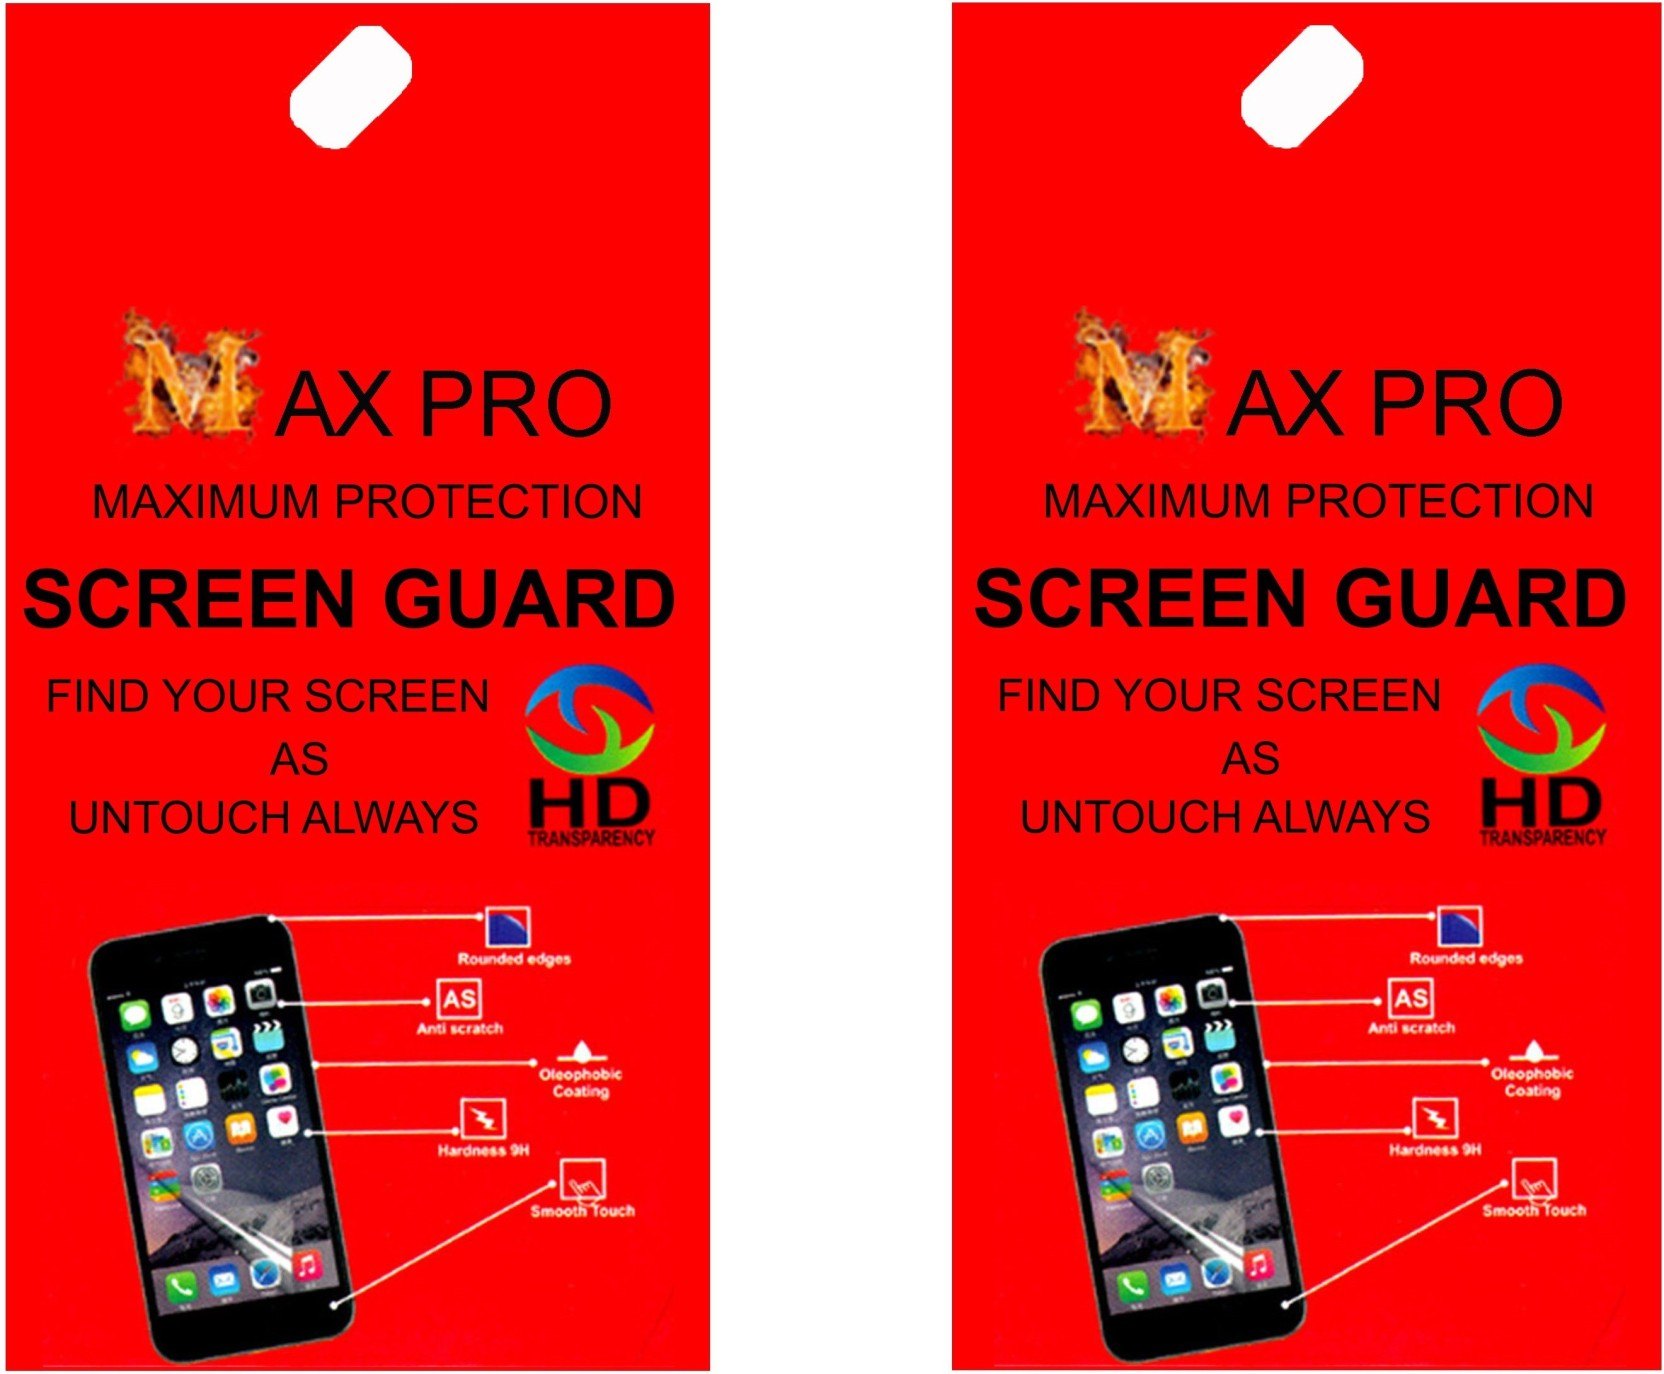 Maxpro Screen Guard For Matte Nokia 3310 Dazzle Diamond Coating Add To Cart